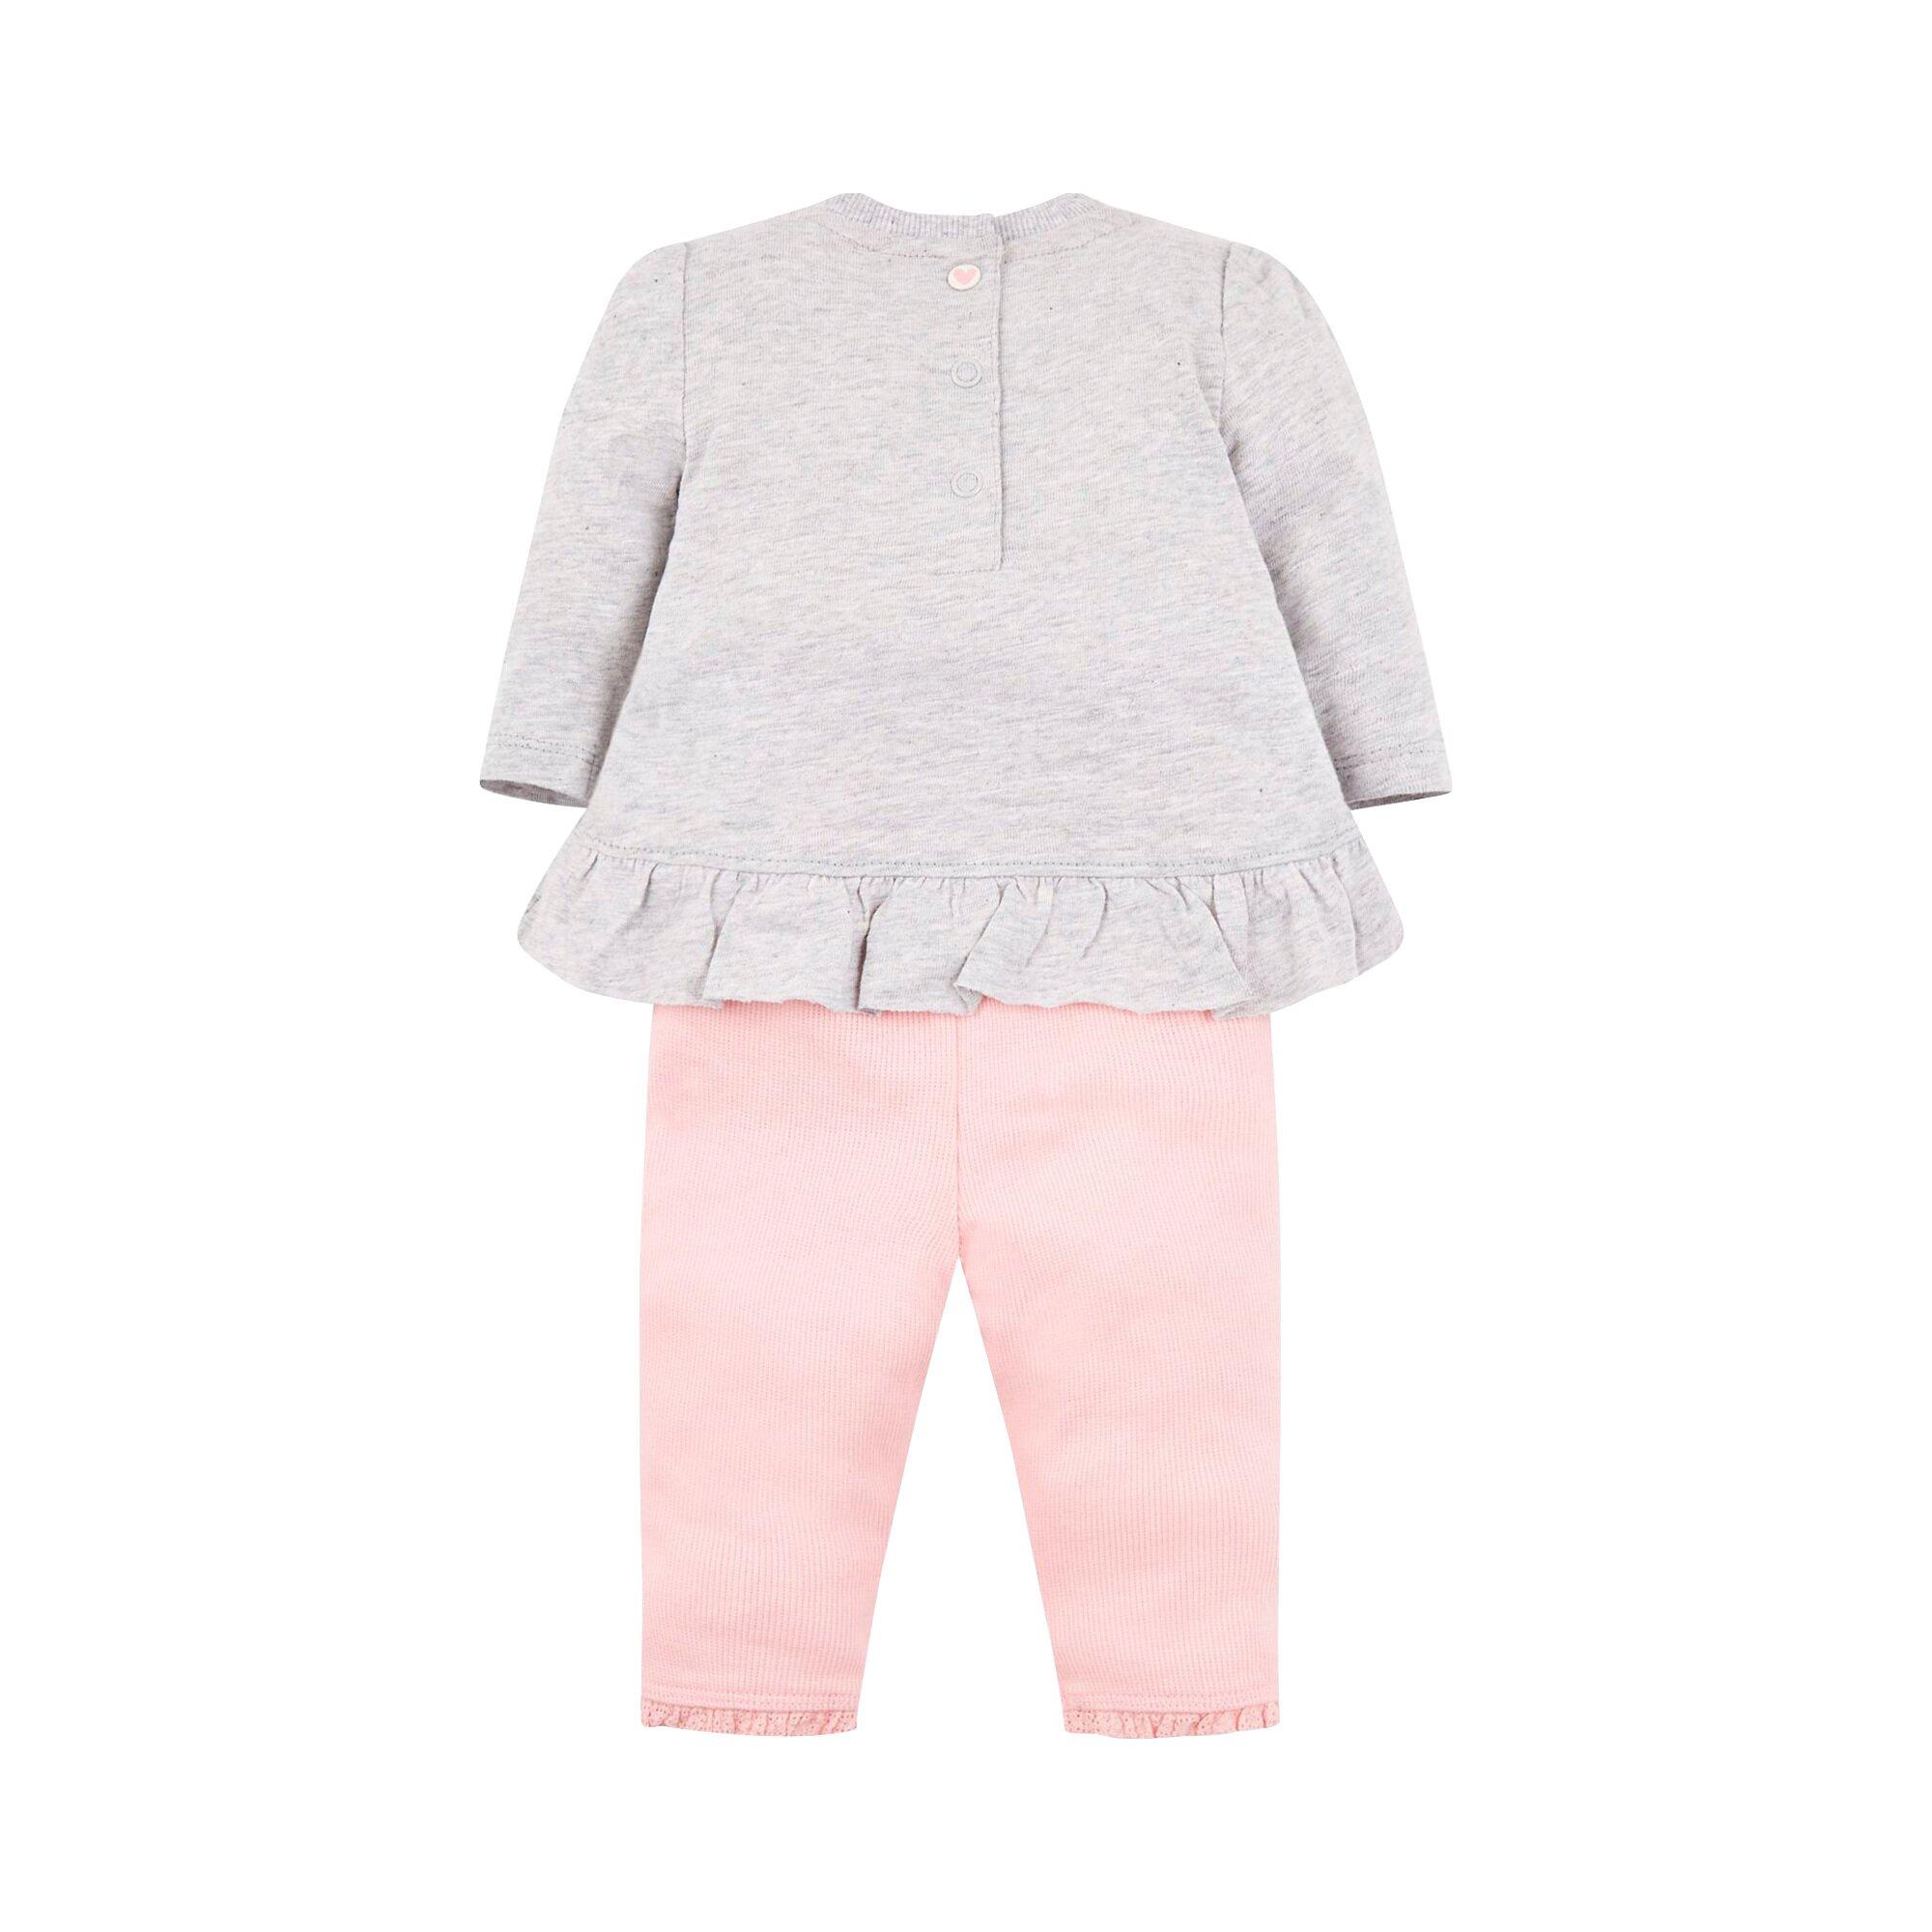 mothercare-2-tlg-set-shirt-langarm-und-leggings-rusche